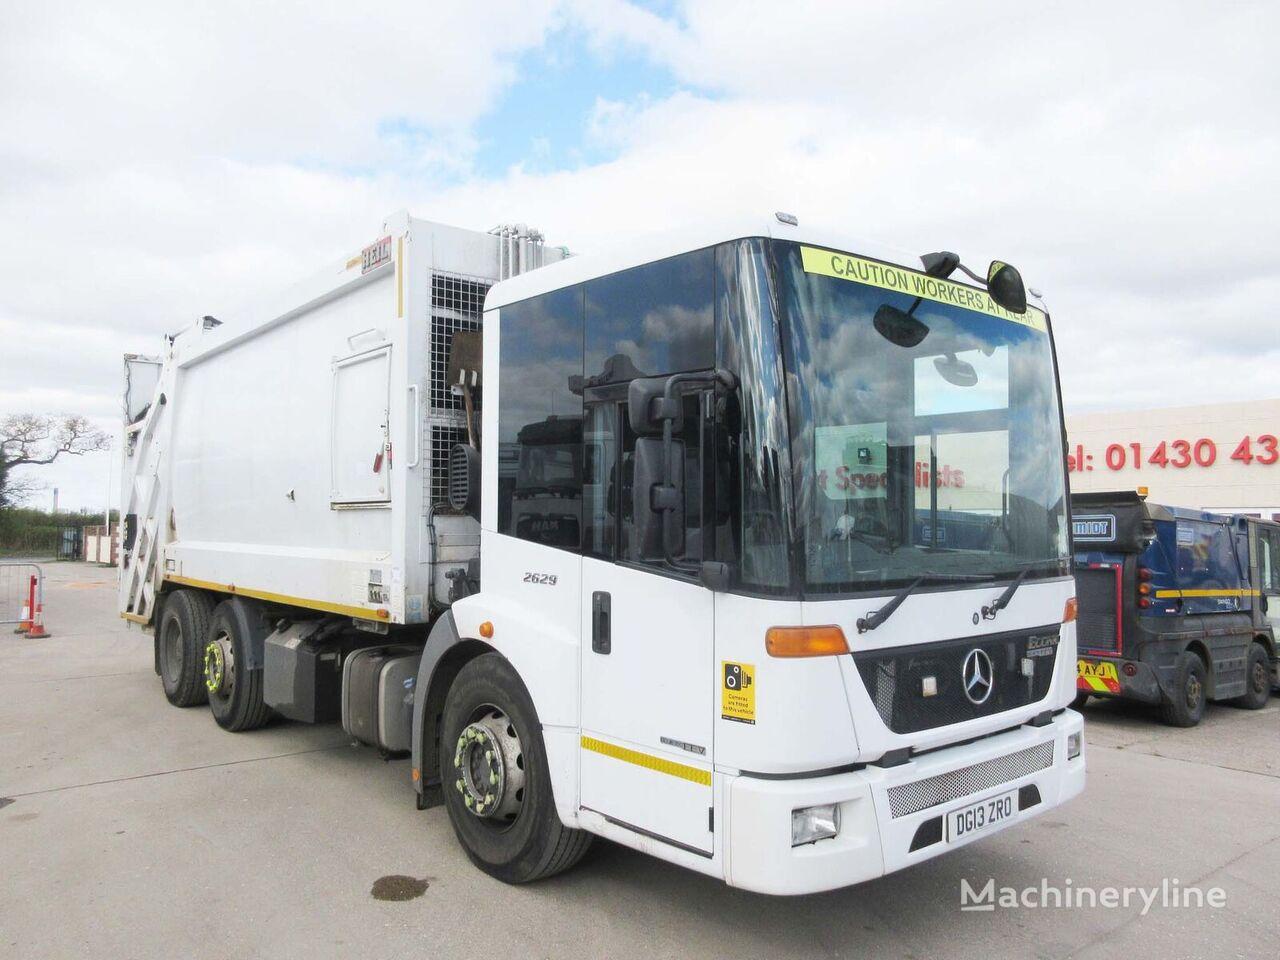 MERCEDES-BENZ Econic 2629 camión de basura